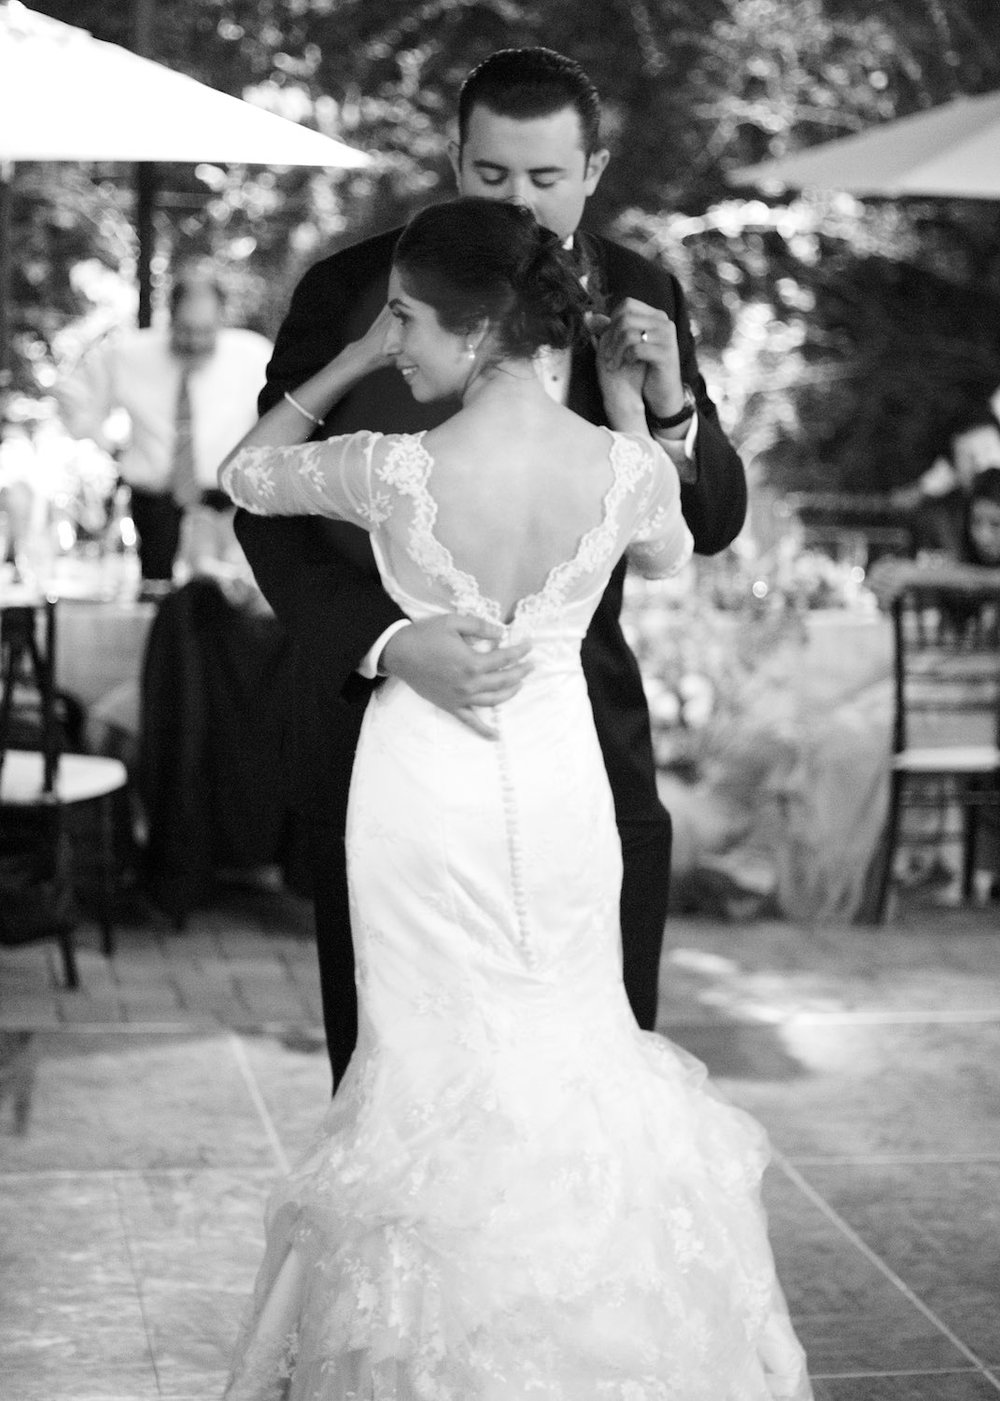 oc-wedding-michal-pfeil-33.jpg